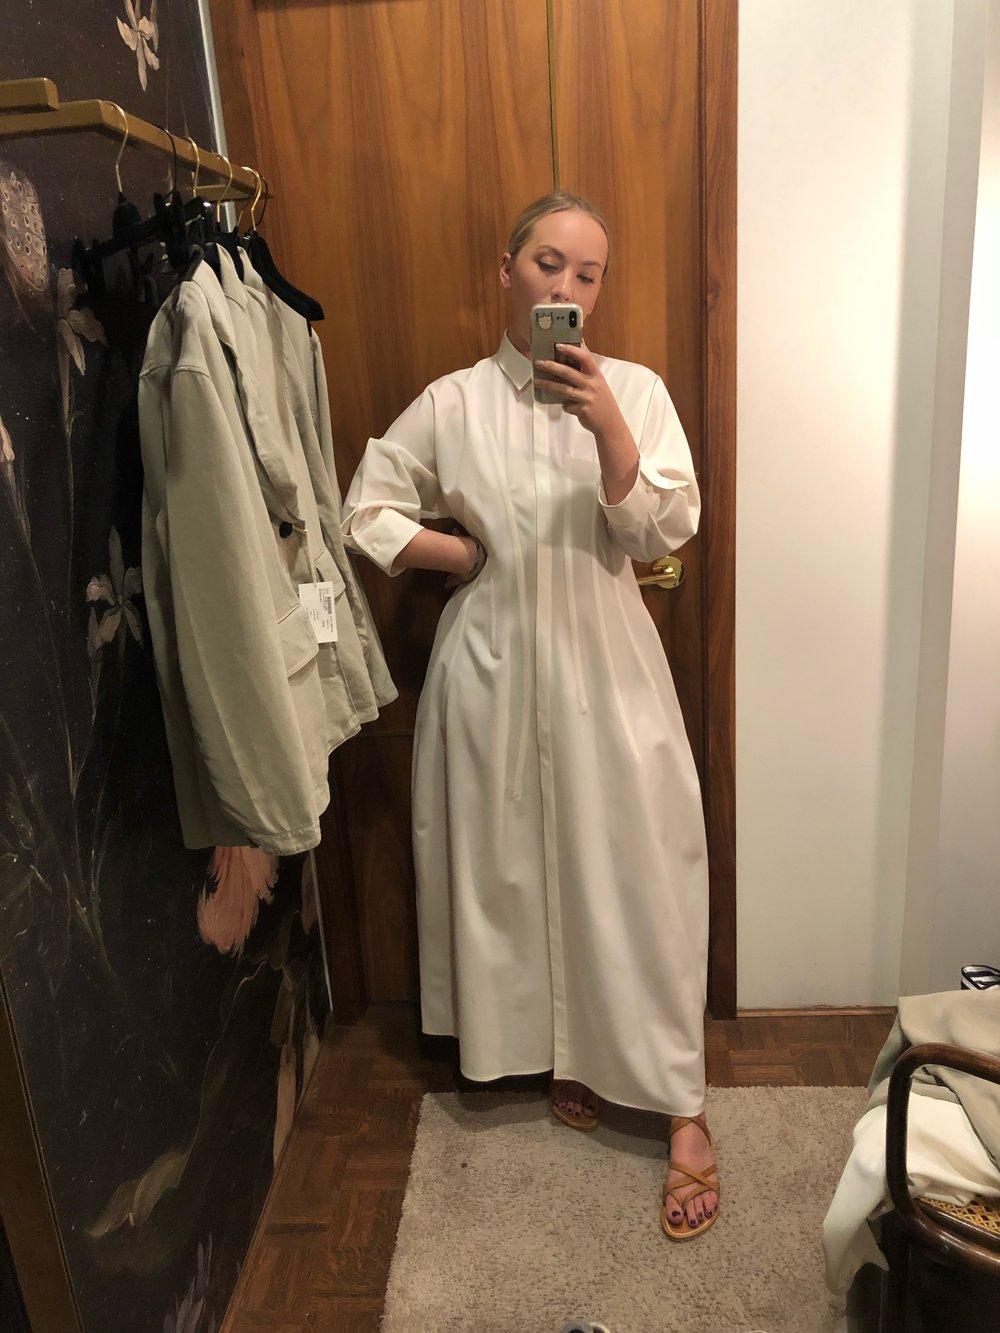 Favorite Item #1 Jil Sander dress worn by daughter #1. ps. sandals by KJaques